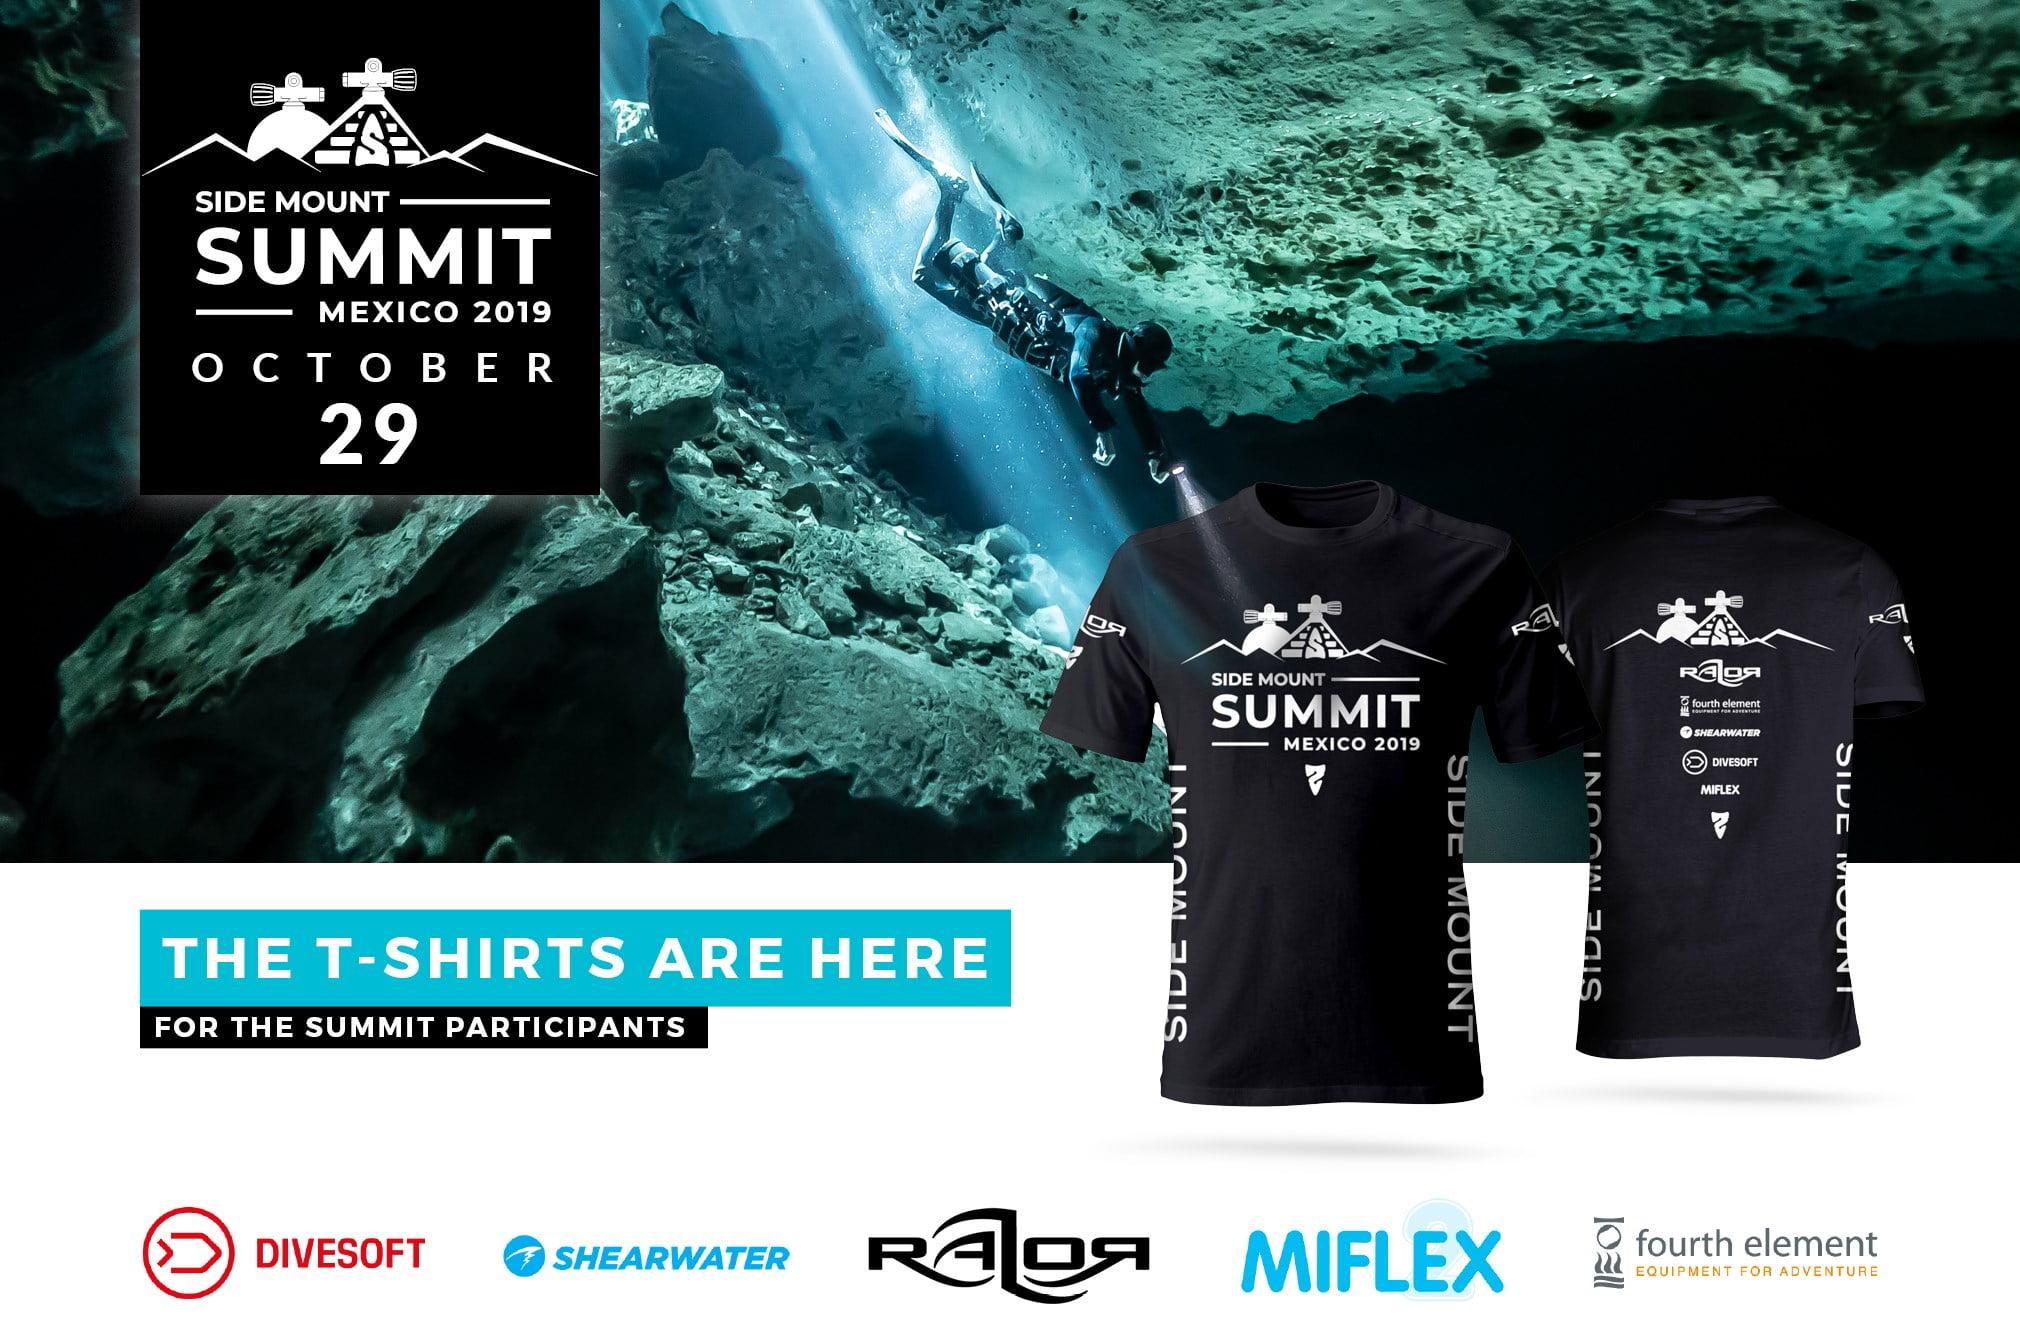 Razor Side Mount Summit 2019 T-Shirt